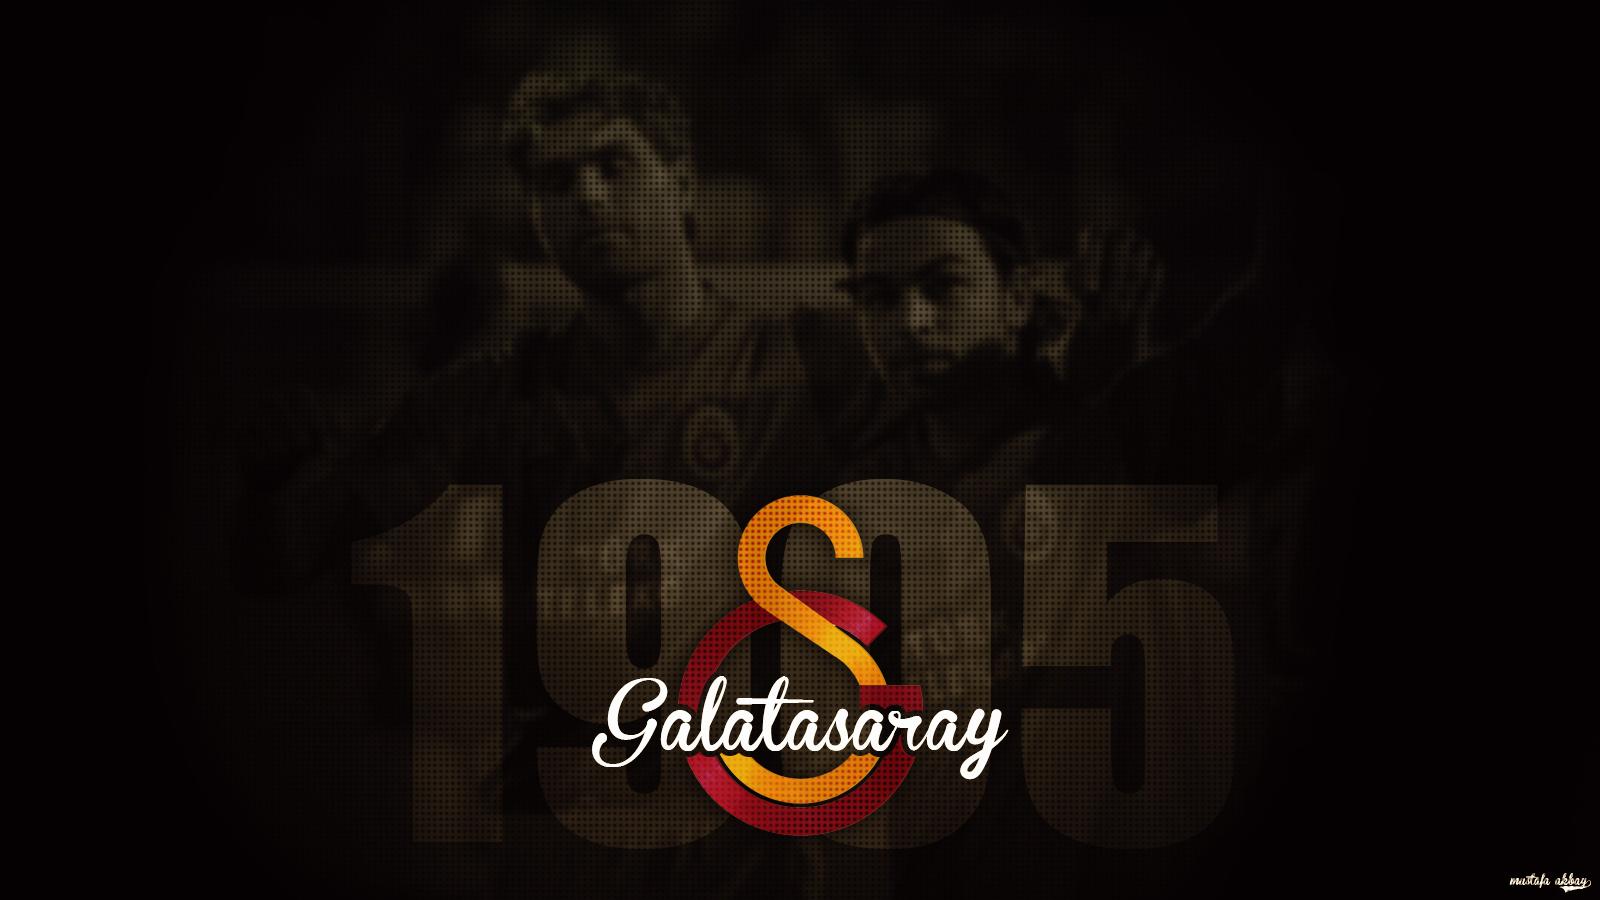 galatasaray 1905 by 07mustafa38 d5gyhma 2013 En Güzel Galatasaray HD Masaüstü Resimleri